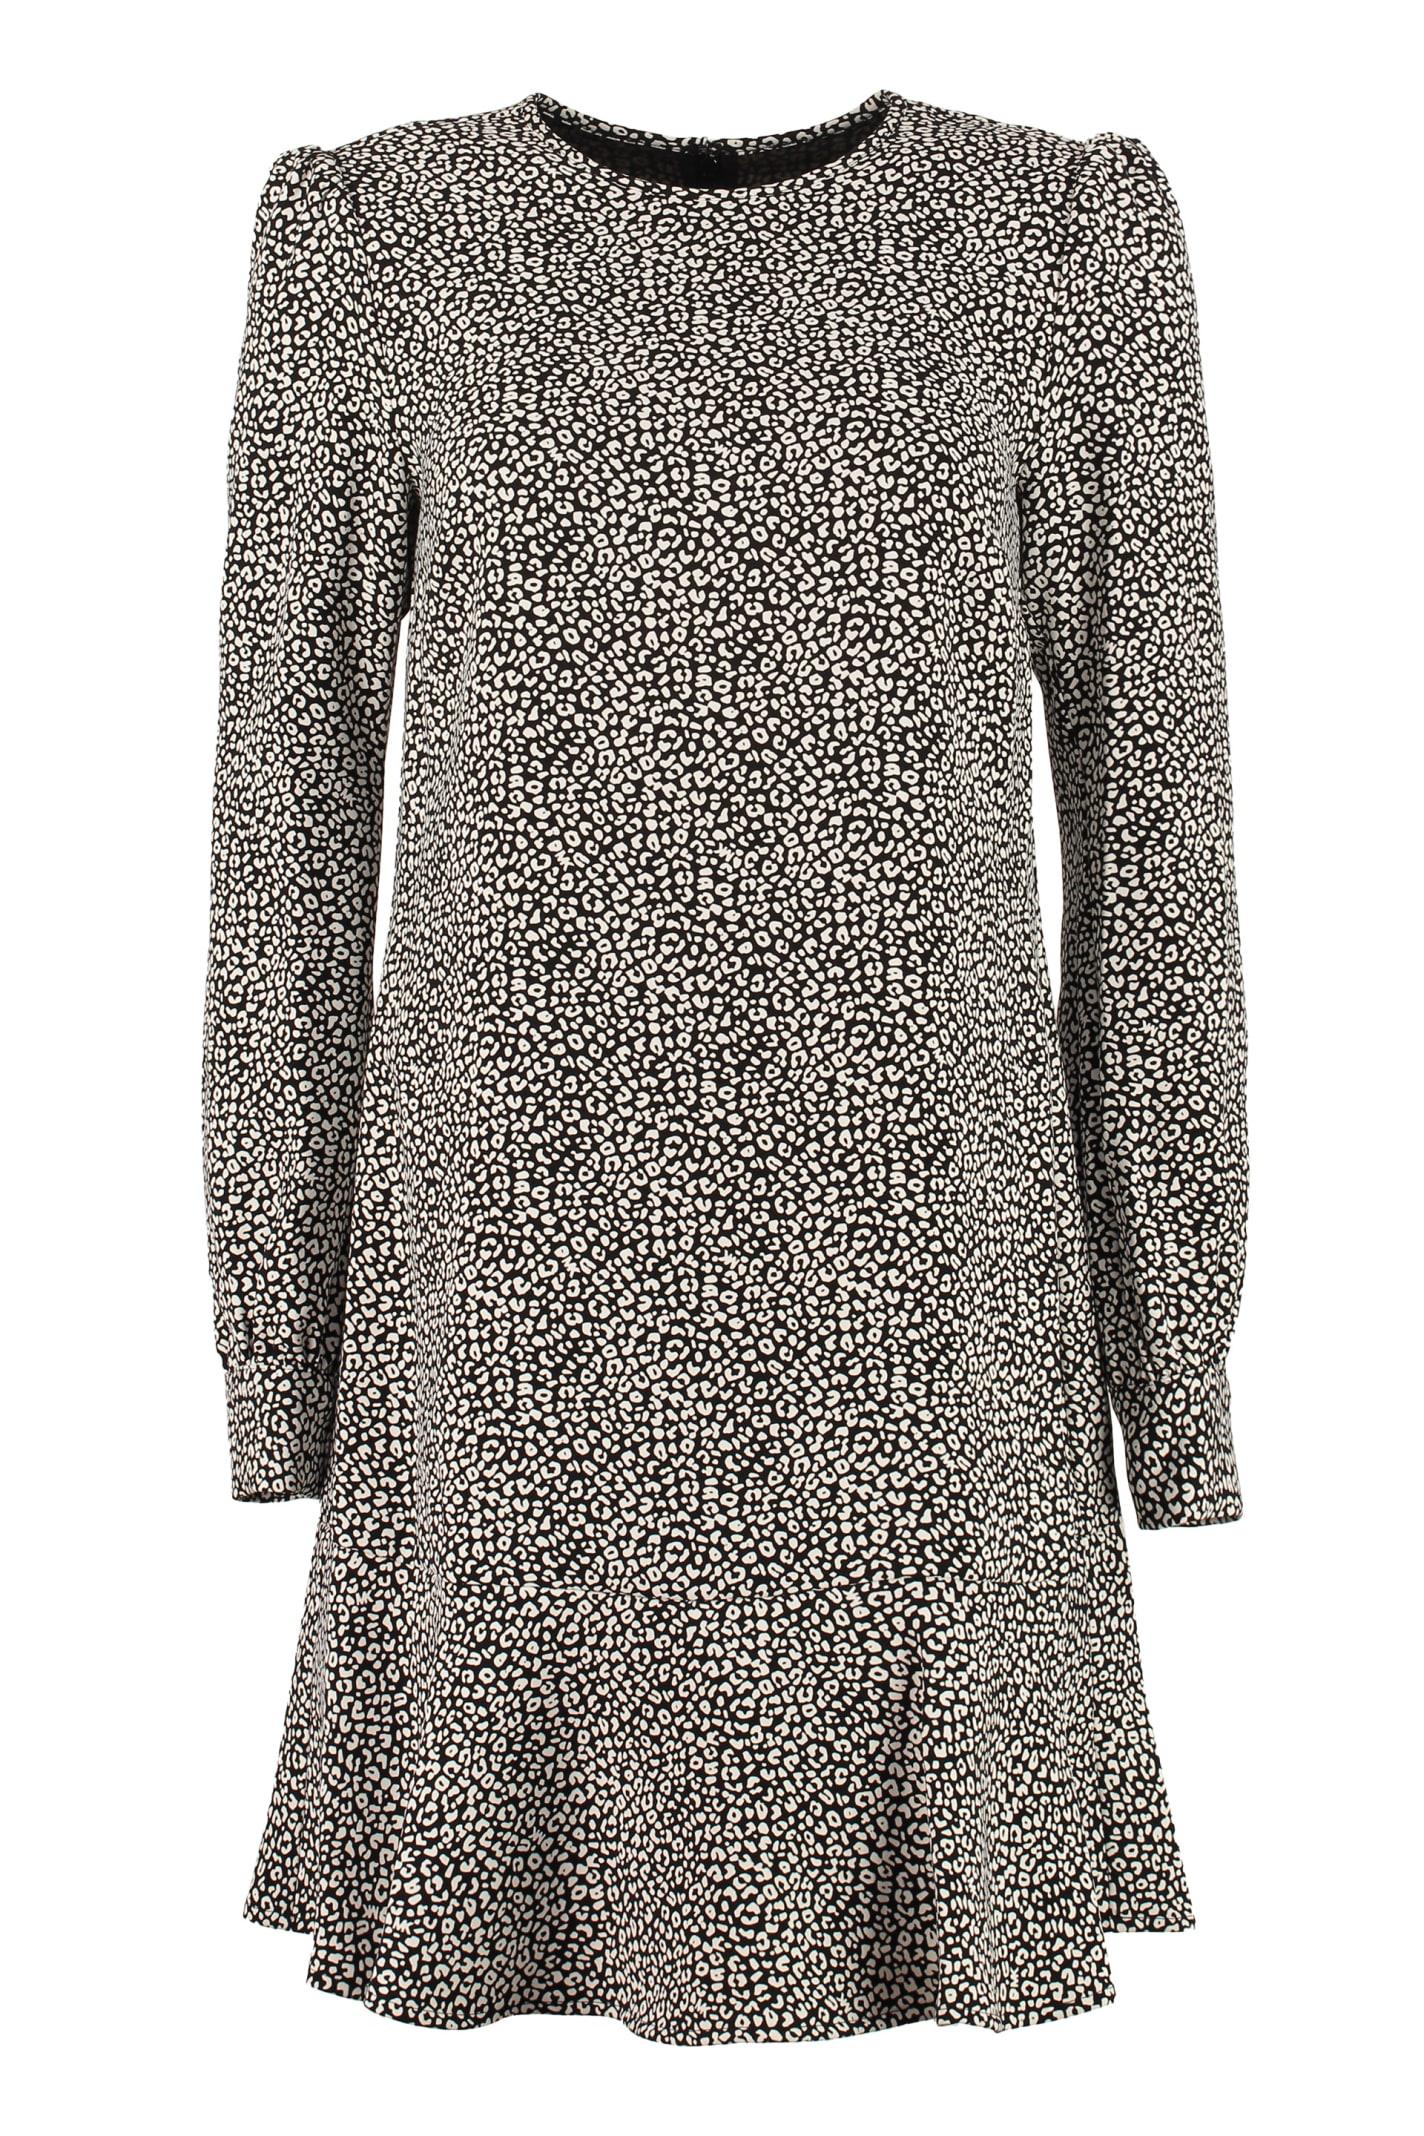 Buy MICHAEL Michael Kors Dress With Raffled Edges online, shop MICHAEL Michael Kors with free shipping